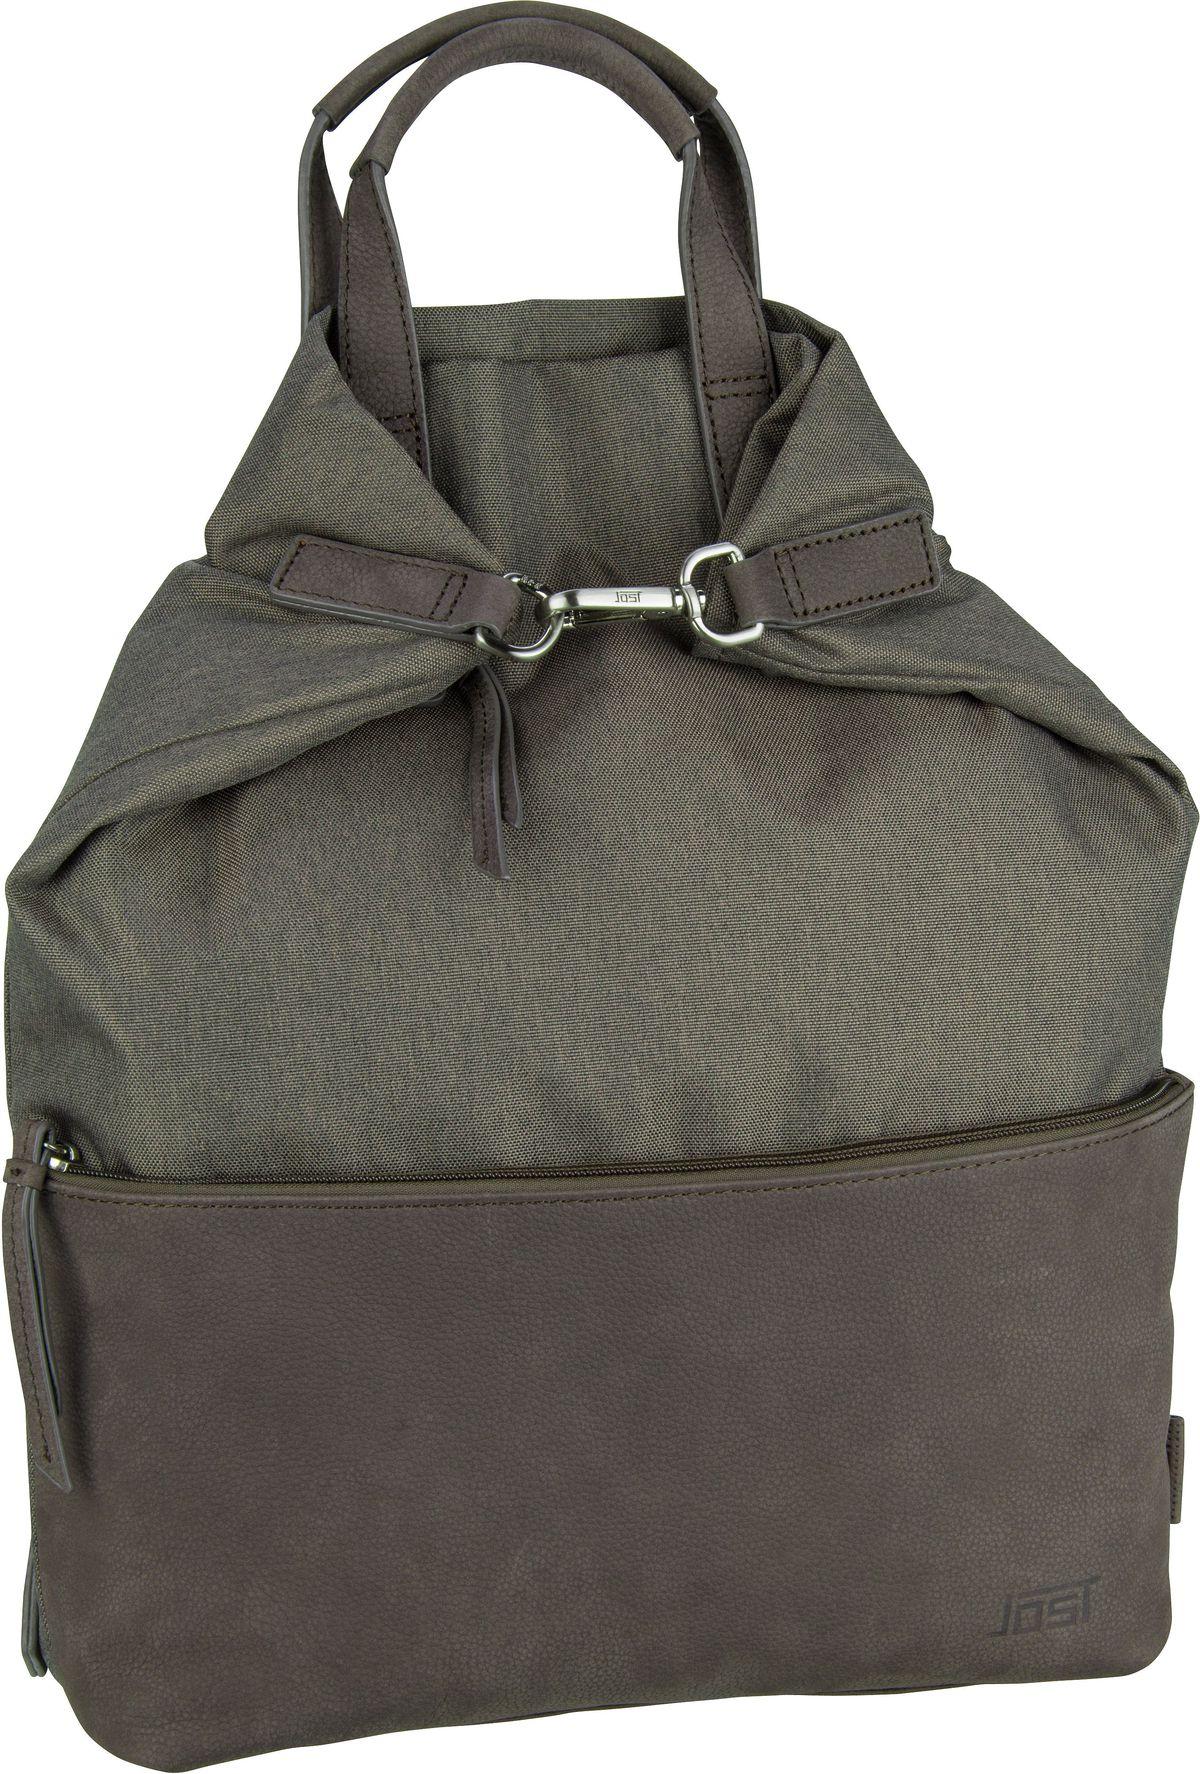 Jost Rucksack / Daypack 2717 X-Change Bag S Taupe